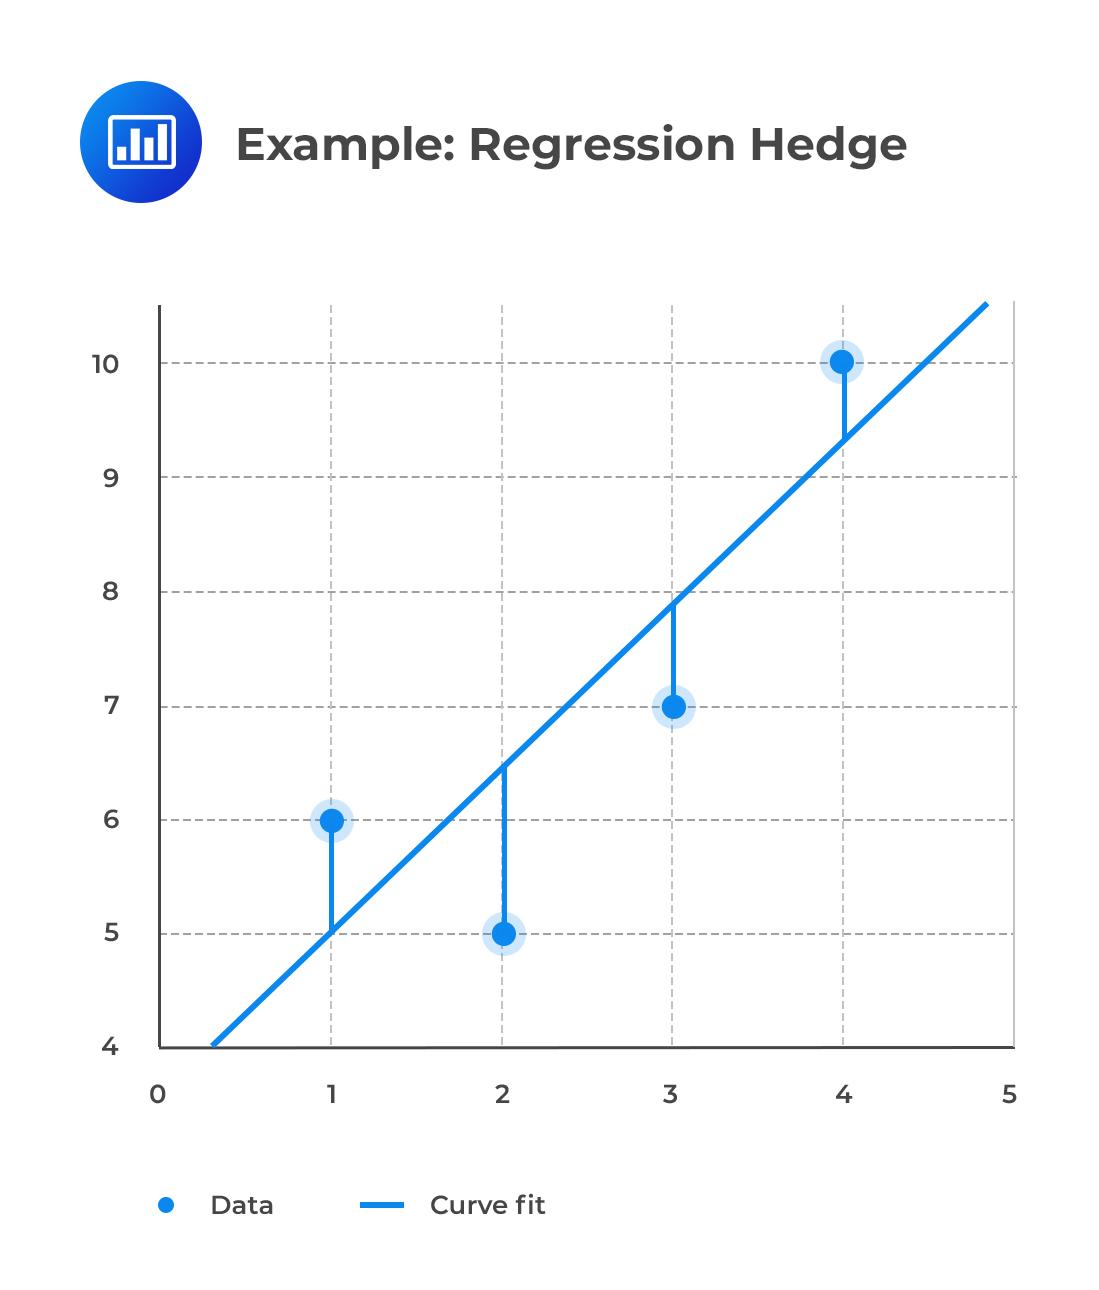 Example: Regression Hedge